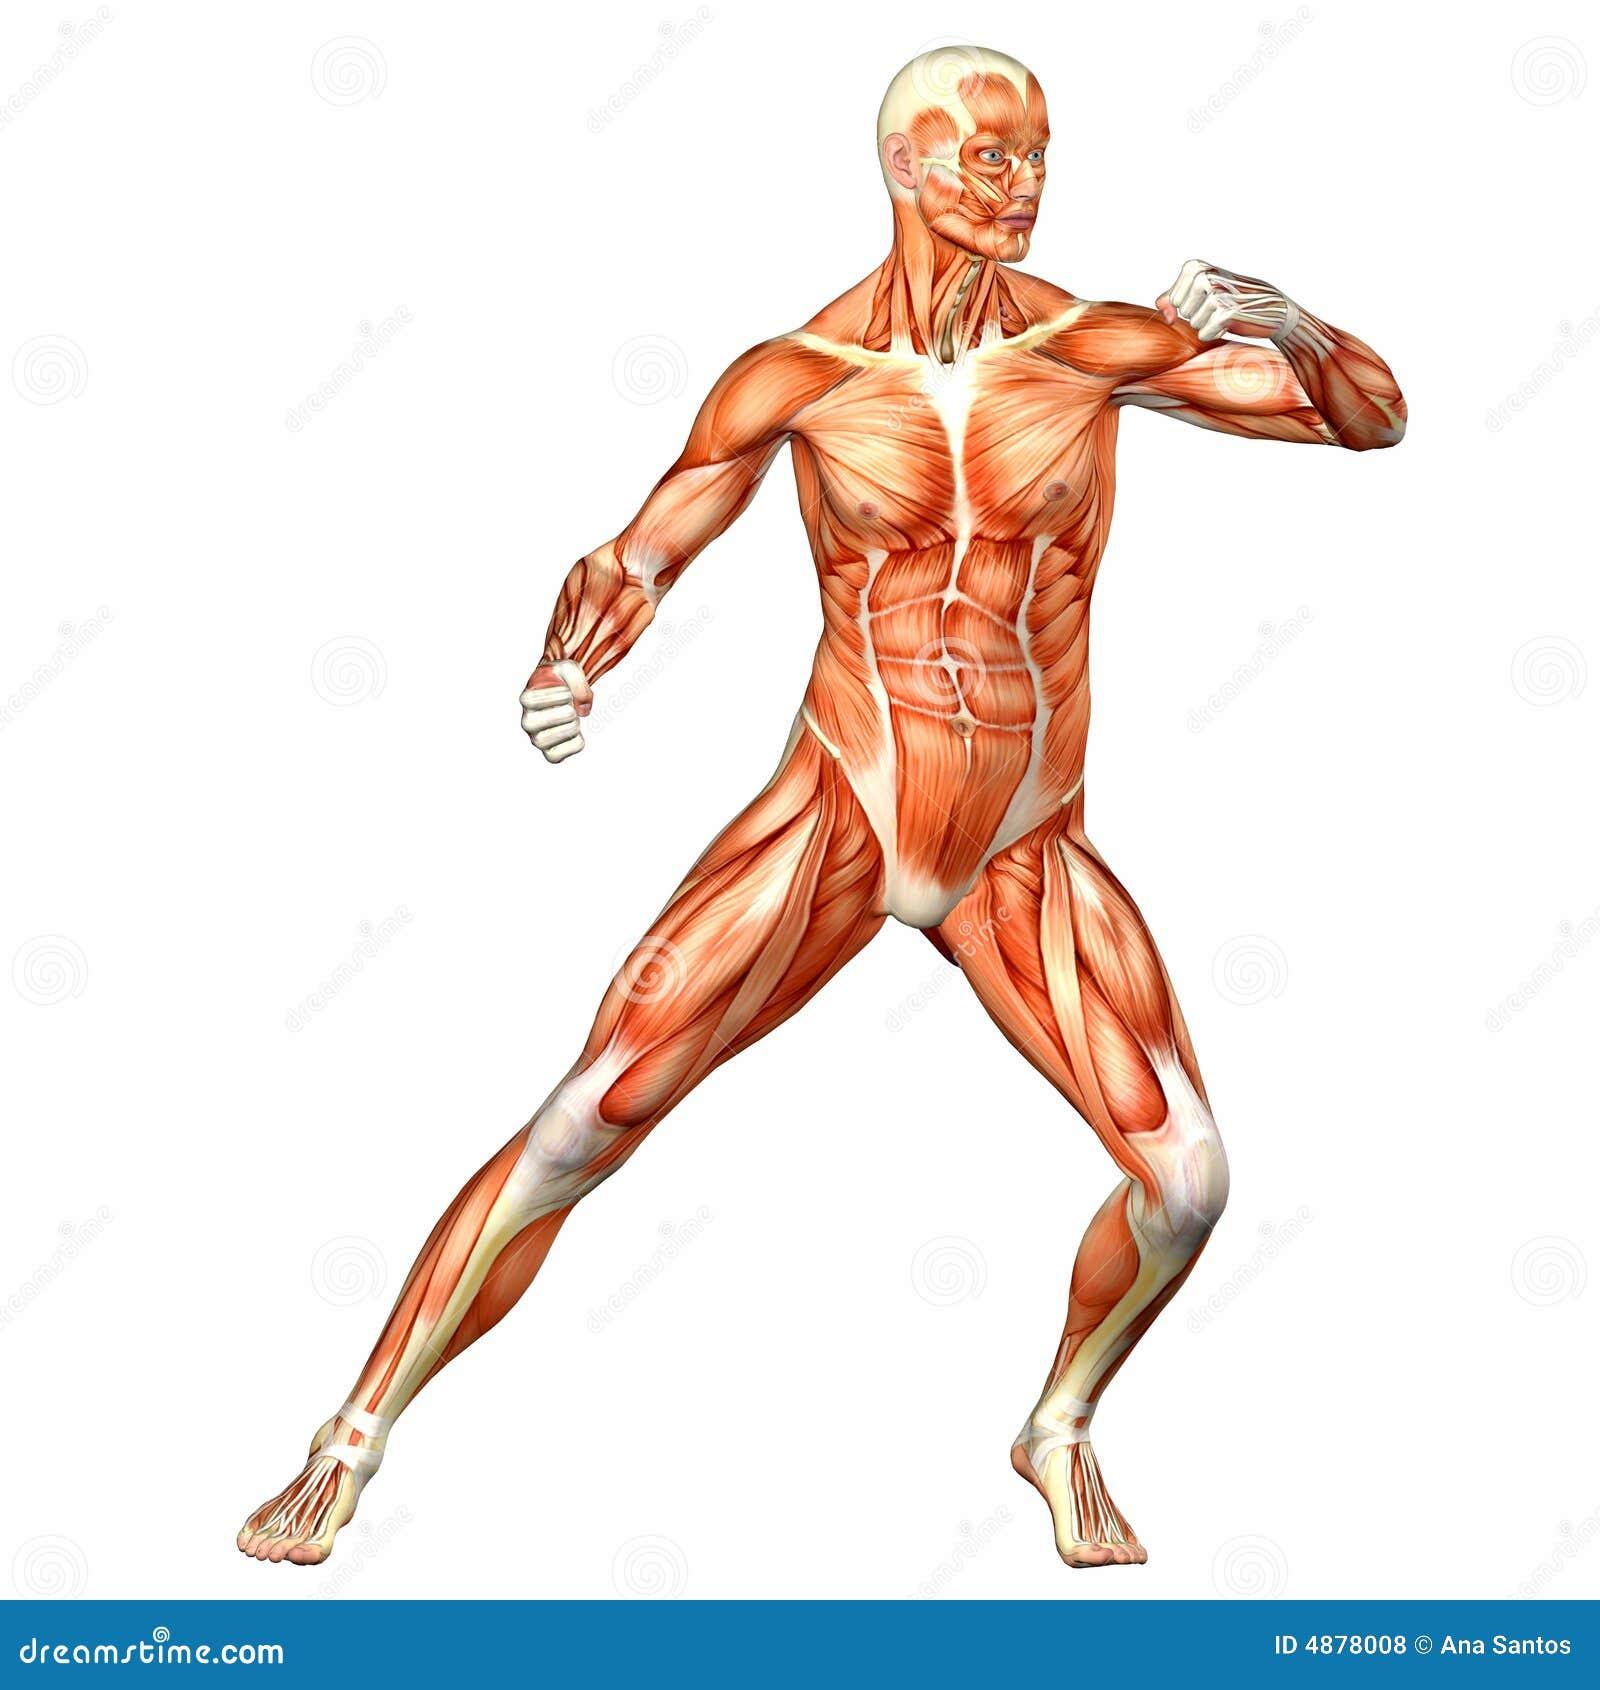 Vistoso Referencia Anatomía Masculina Modelo - Anatomía de Las ...